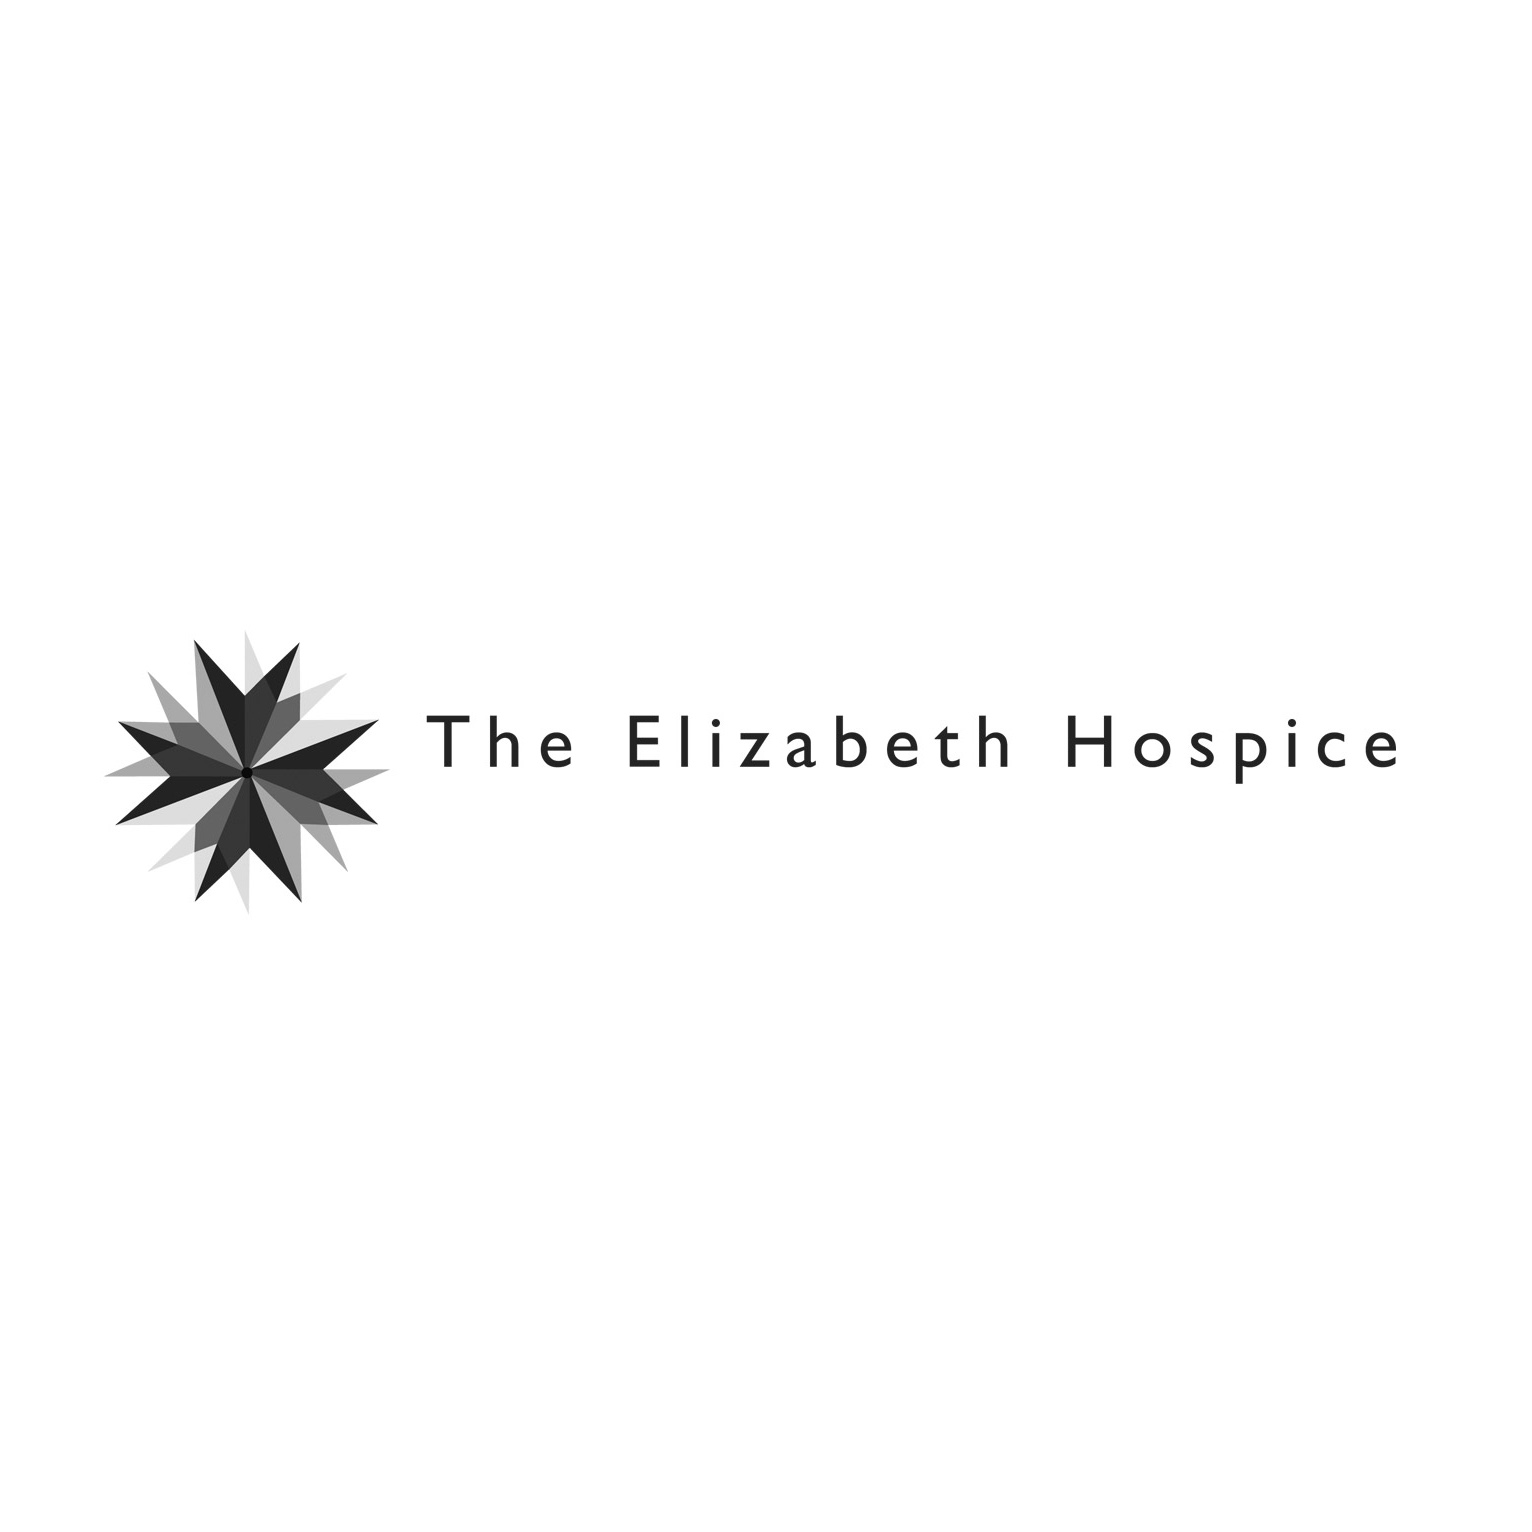 img_partner_logo_elizabeth_hospice_square.jpg